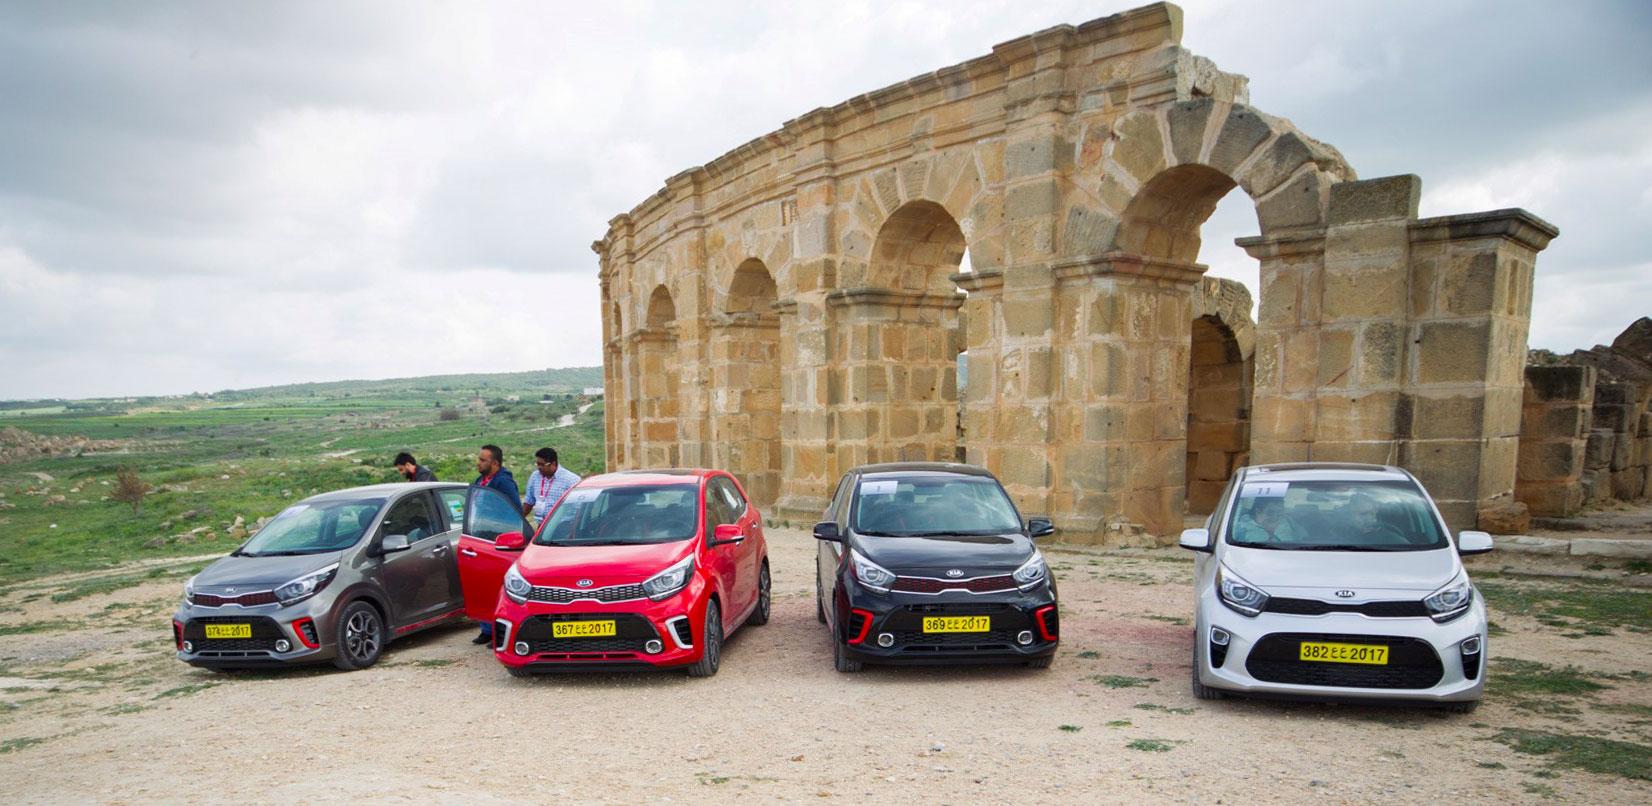 Essai KIA Picanto 2017 en Tunisie